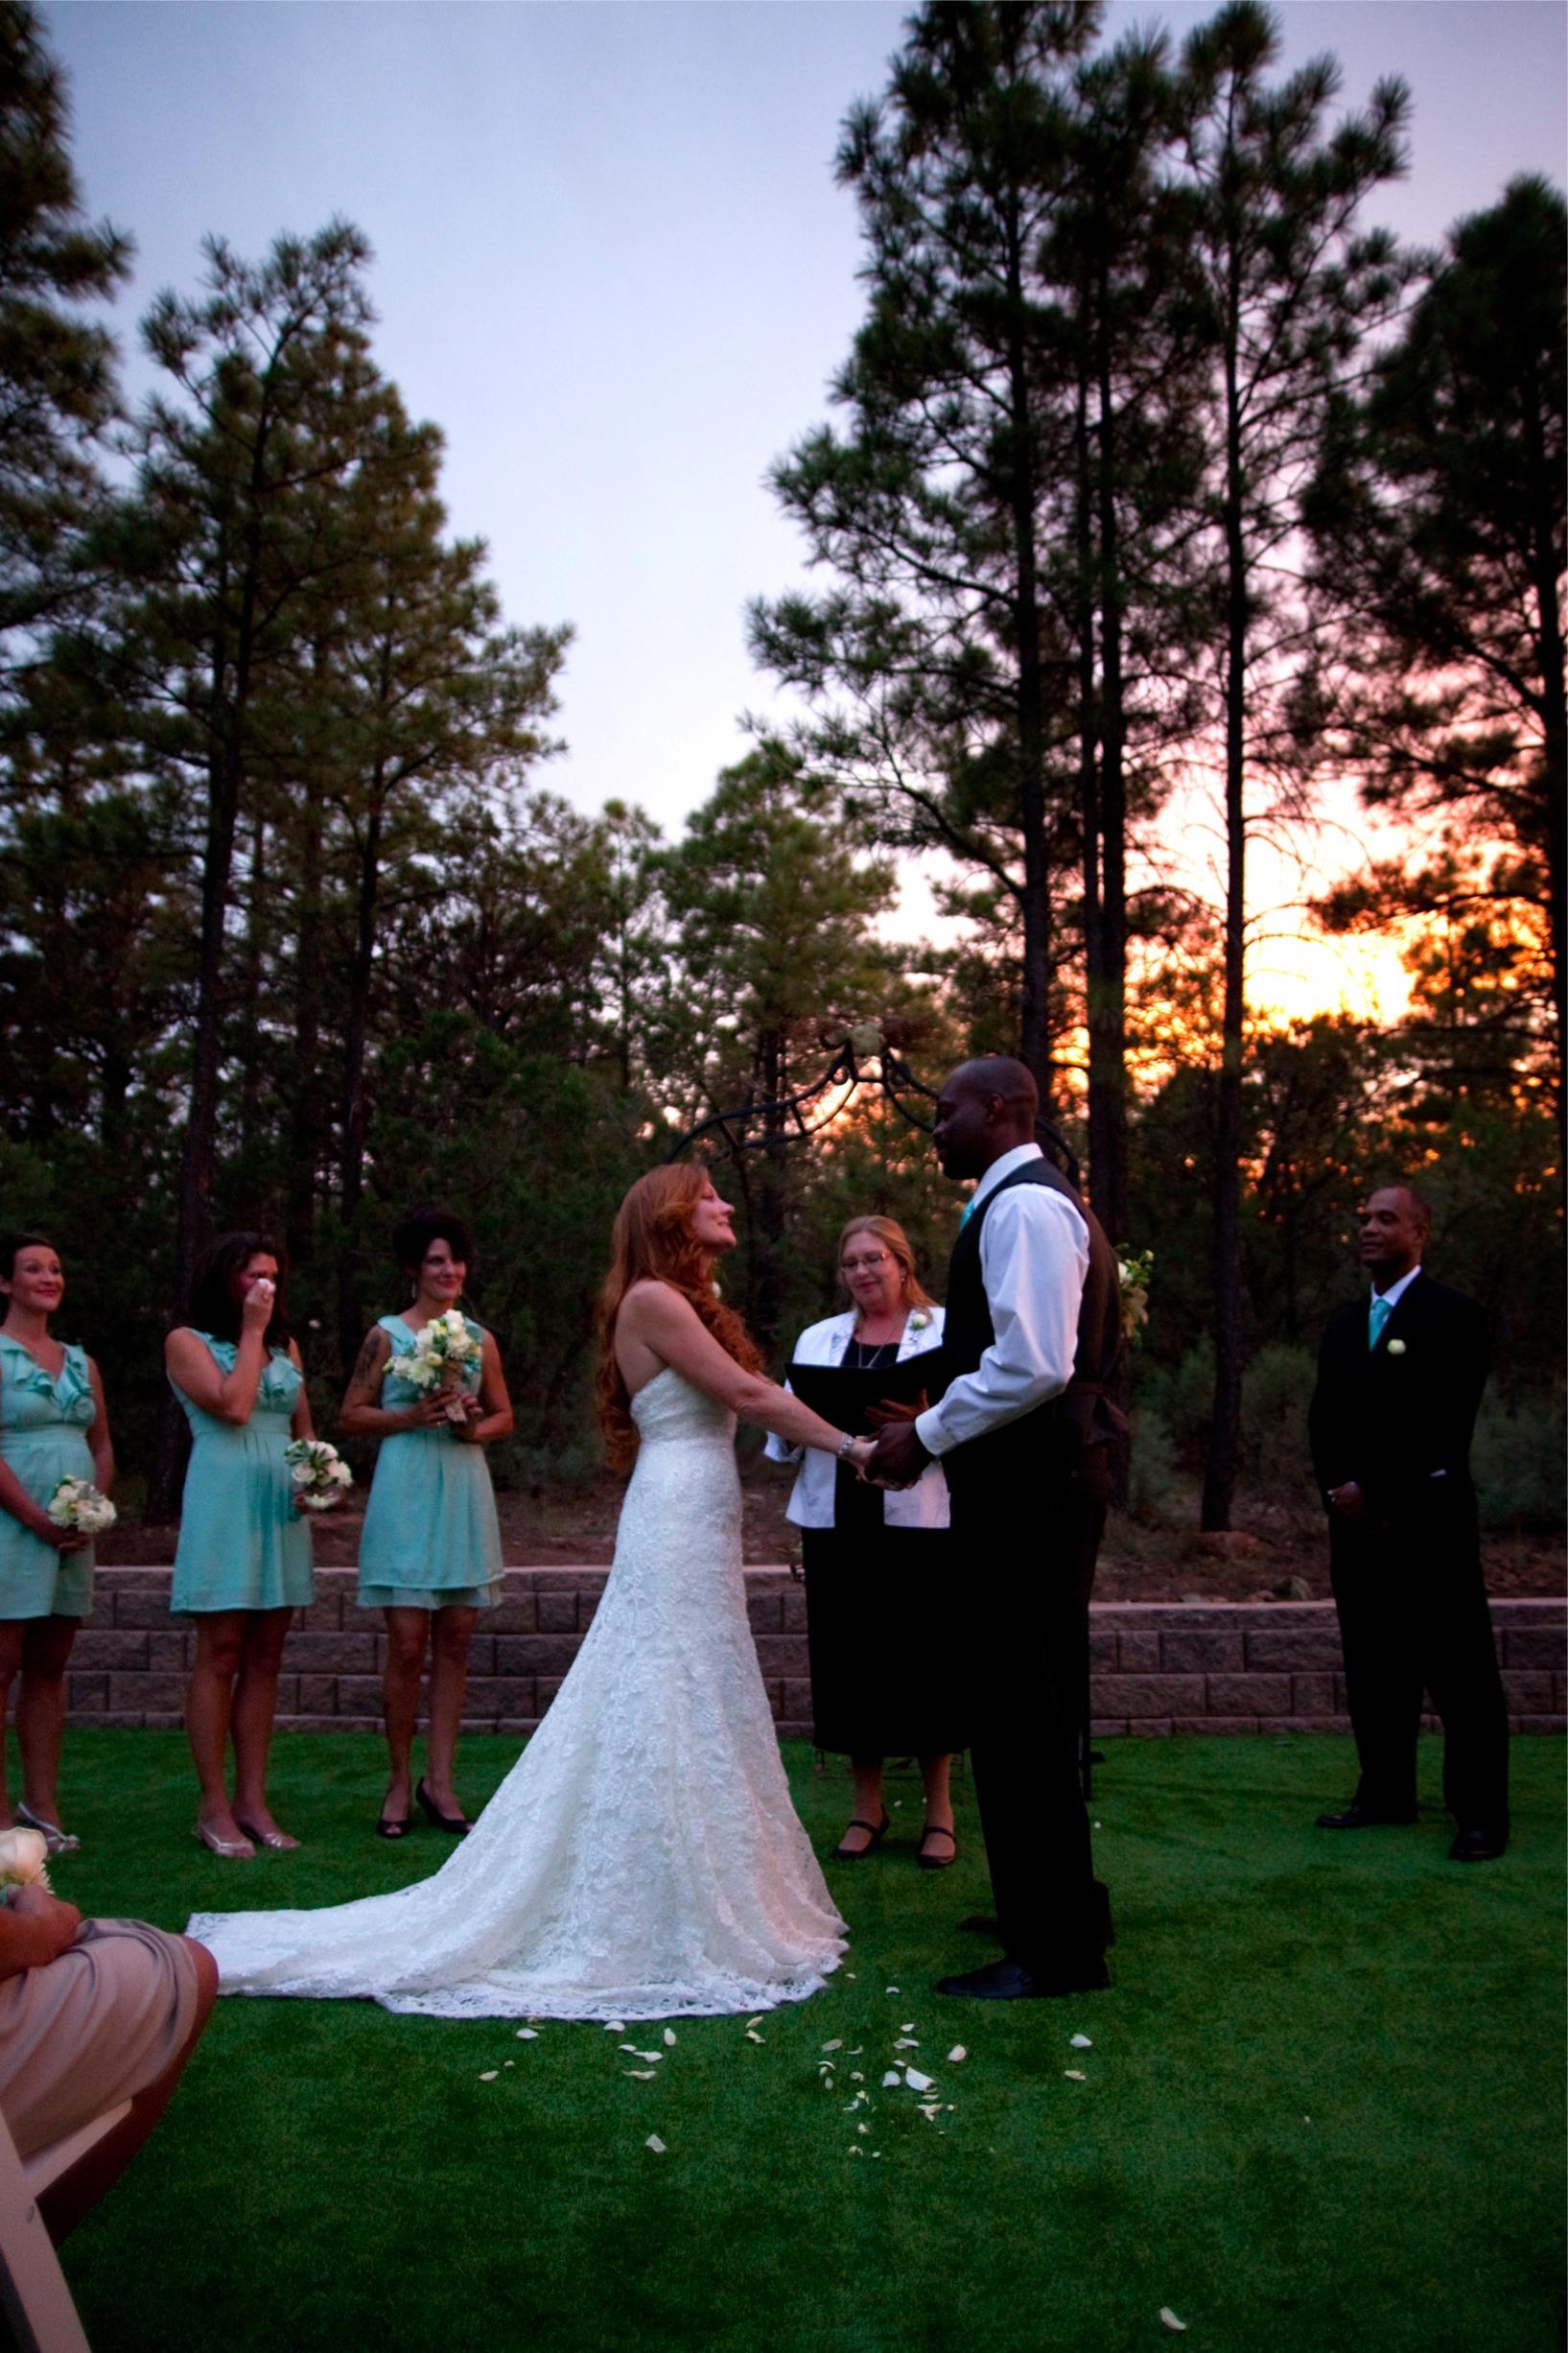 Wedding on the grass-221.jpg